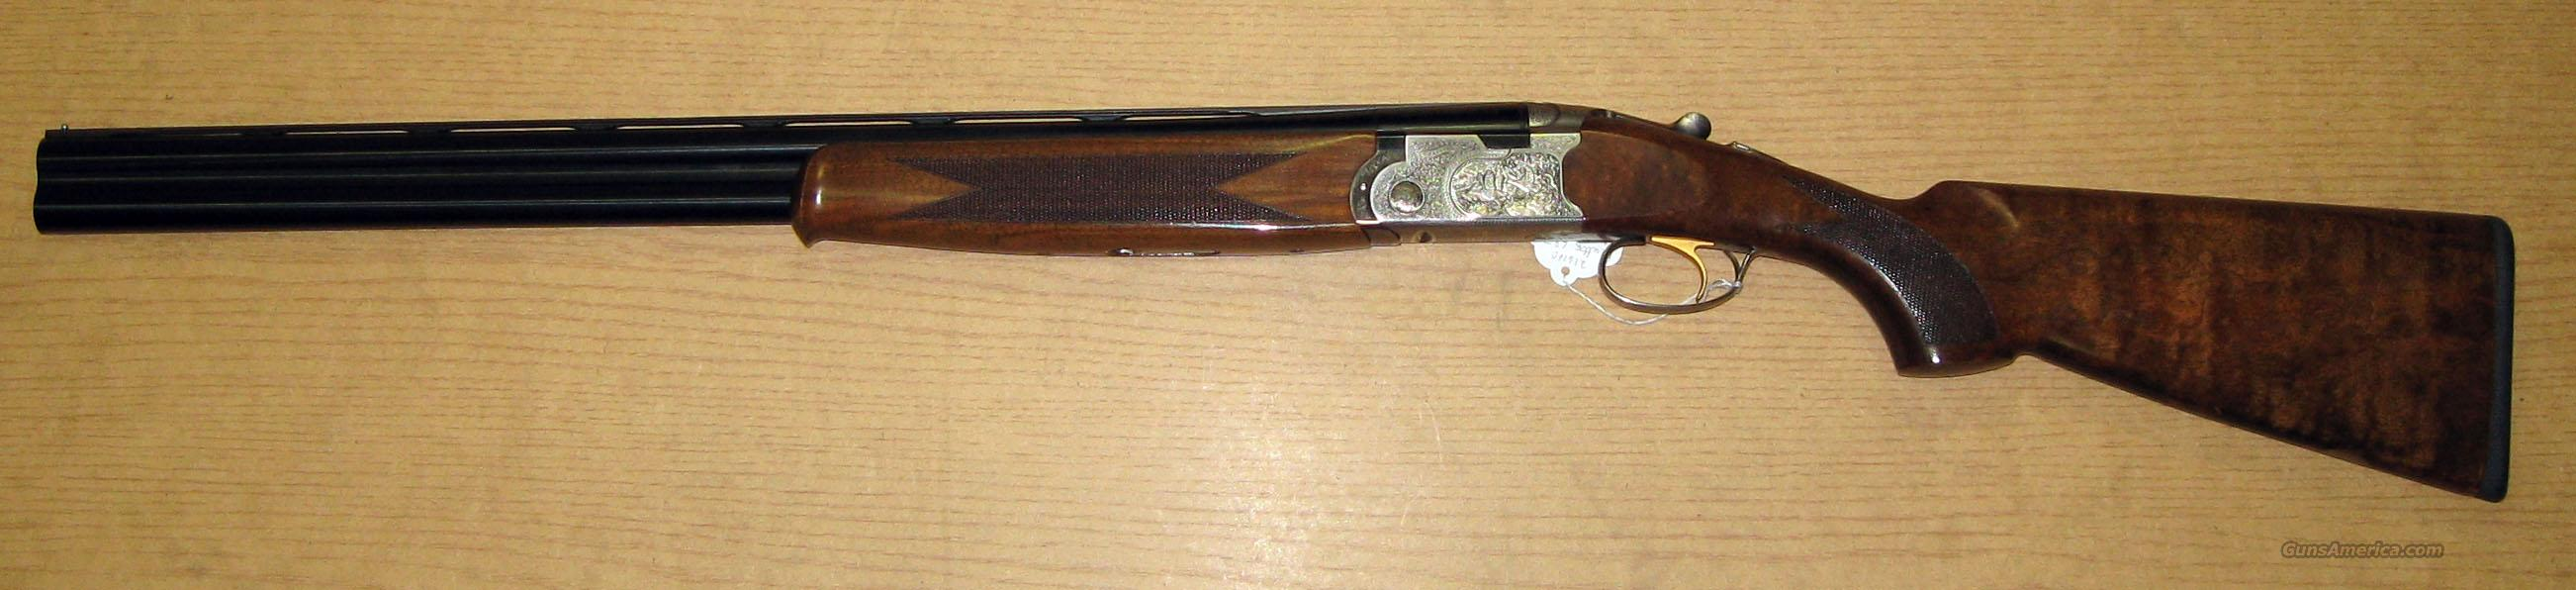 Beretta 687 Silver Pigeon II 12ga.  Guns > Shotguns > Beretta Shotguns > O/U > Trap/Skeet